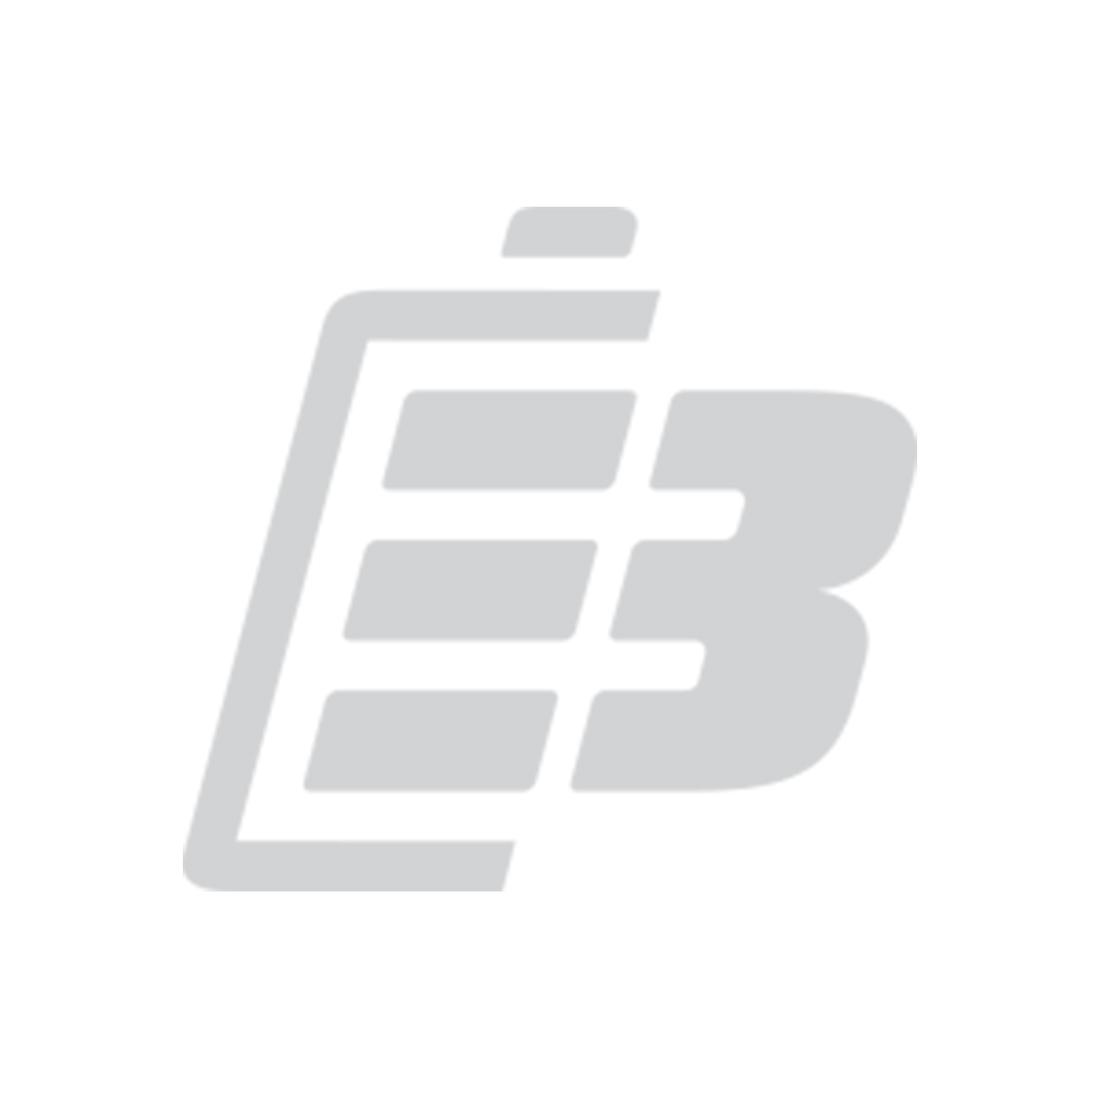 Power tool battery Dewalt 14.4V 3.0Ah_1